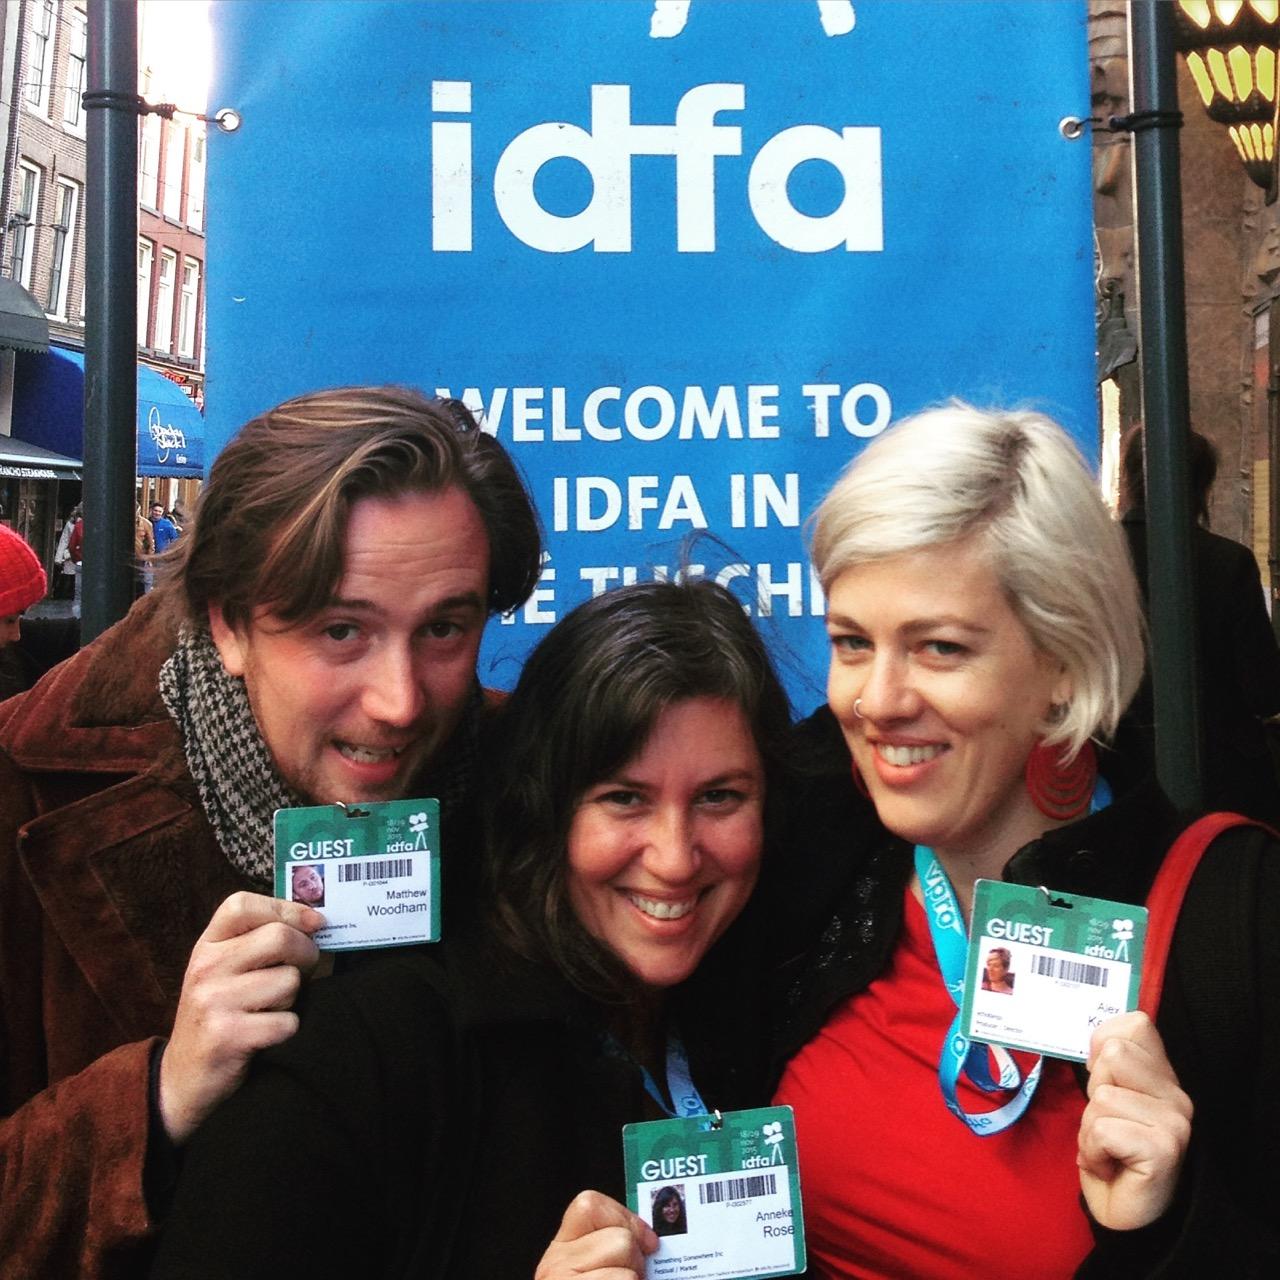 Something Somewhere Film Festival Directors Matthew Woodham, Anneke Rose and Alex Kelly at the International Documentary Film Festival in Amsterdam, 2015.